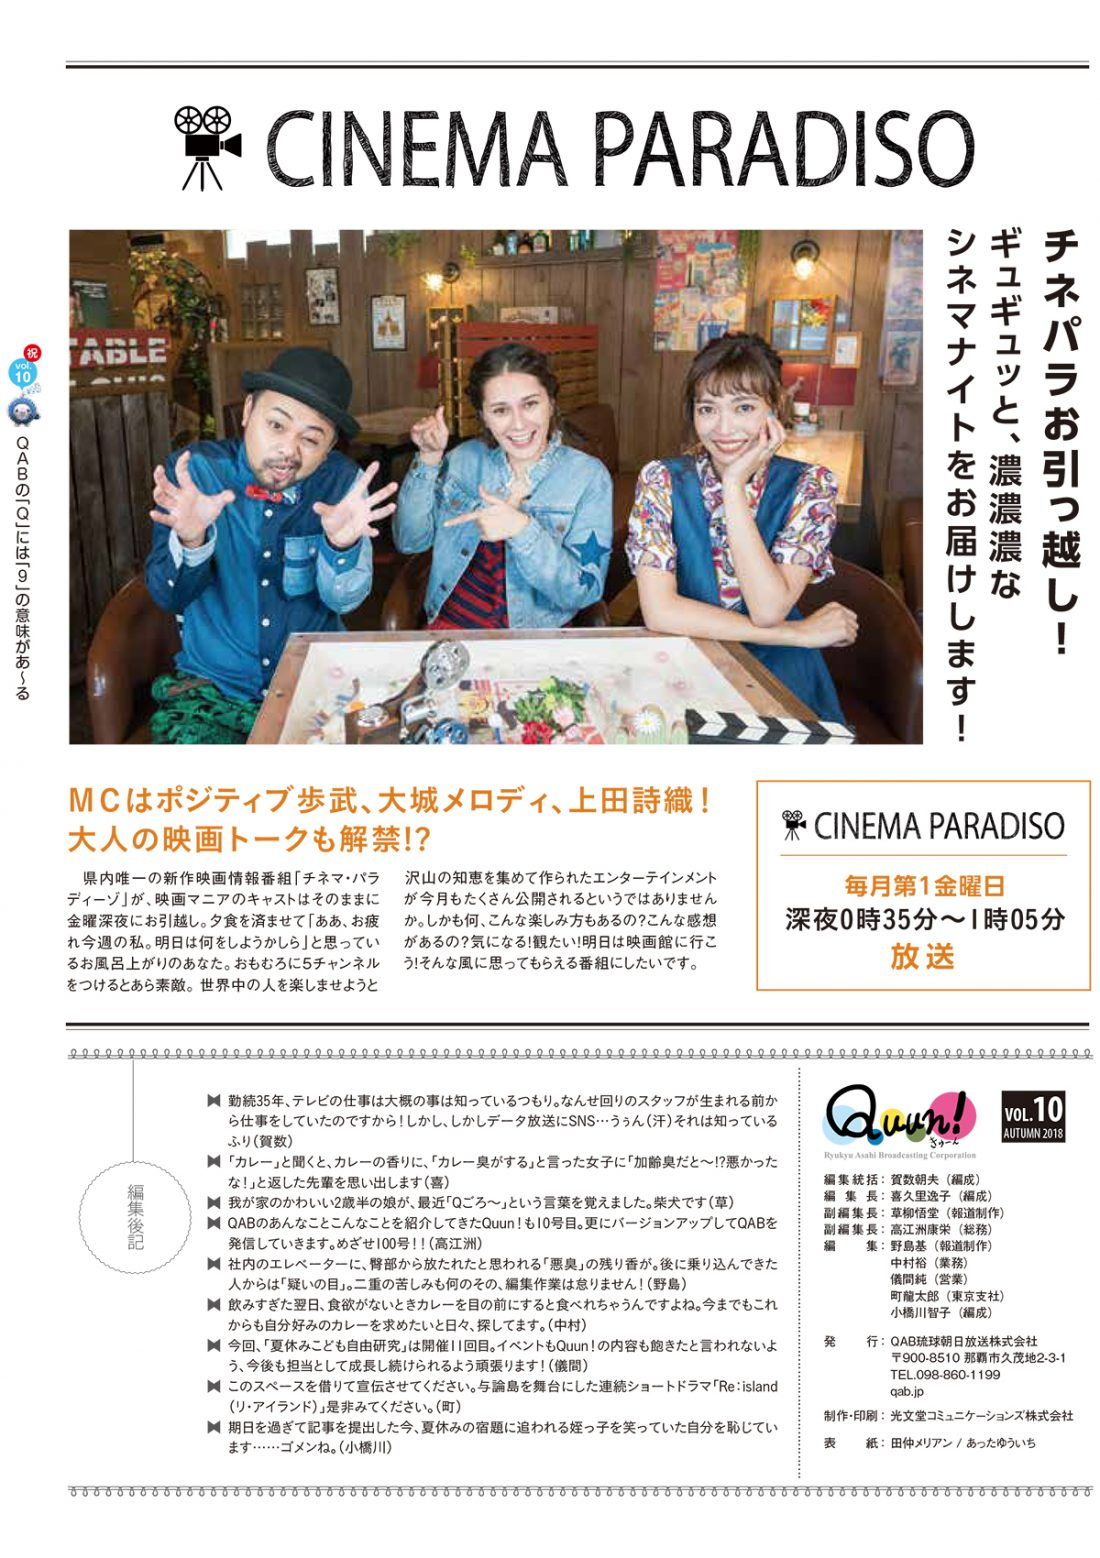 https://www.qab.co.jp/qgoro/wp-content/uploads/quun_1015-1100x1558.jpg